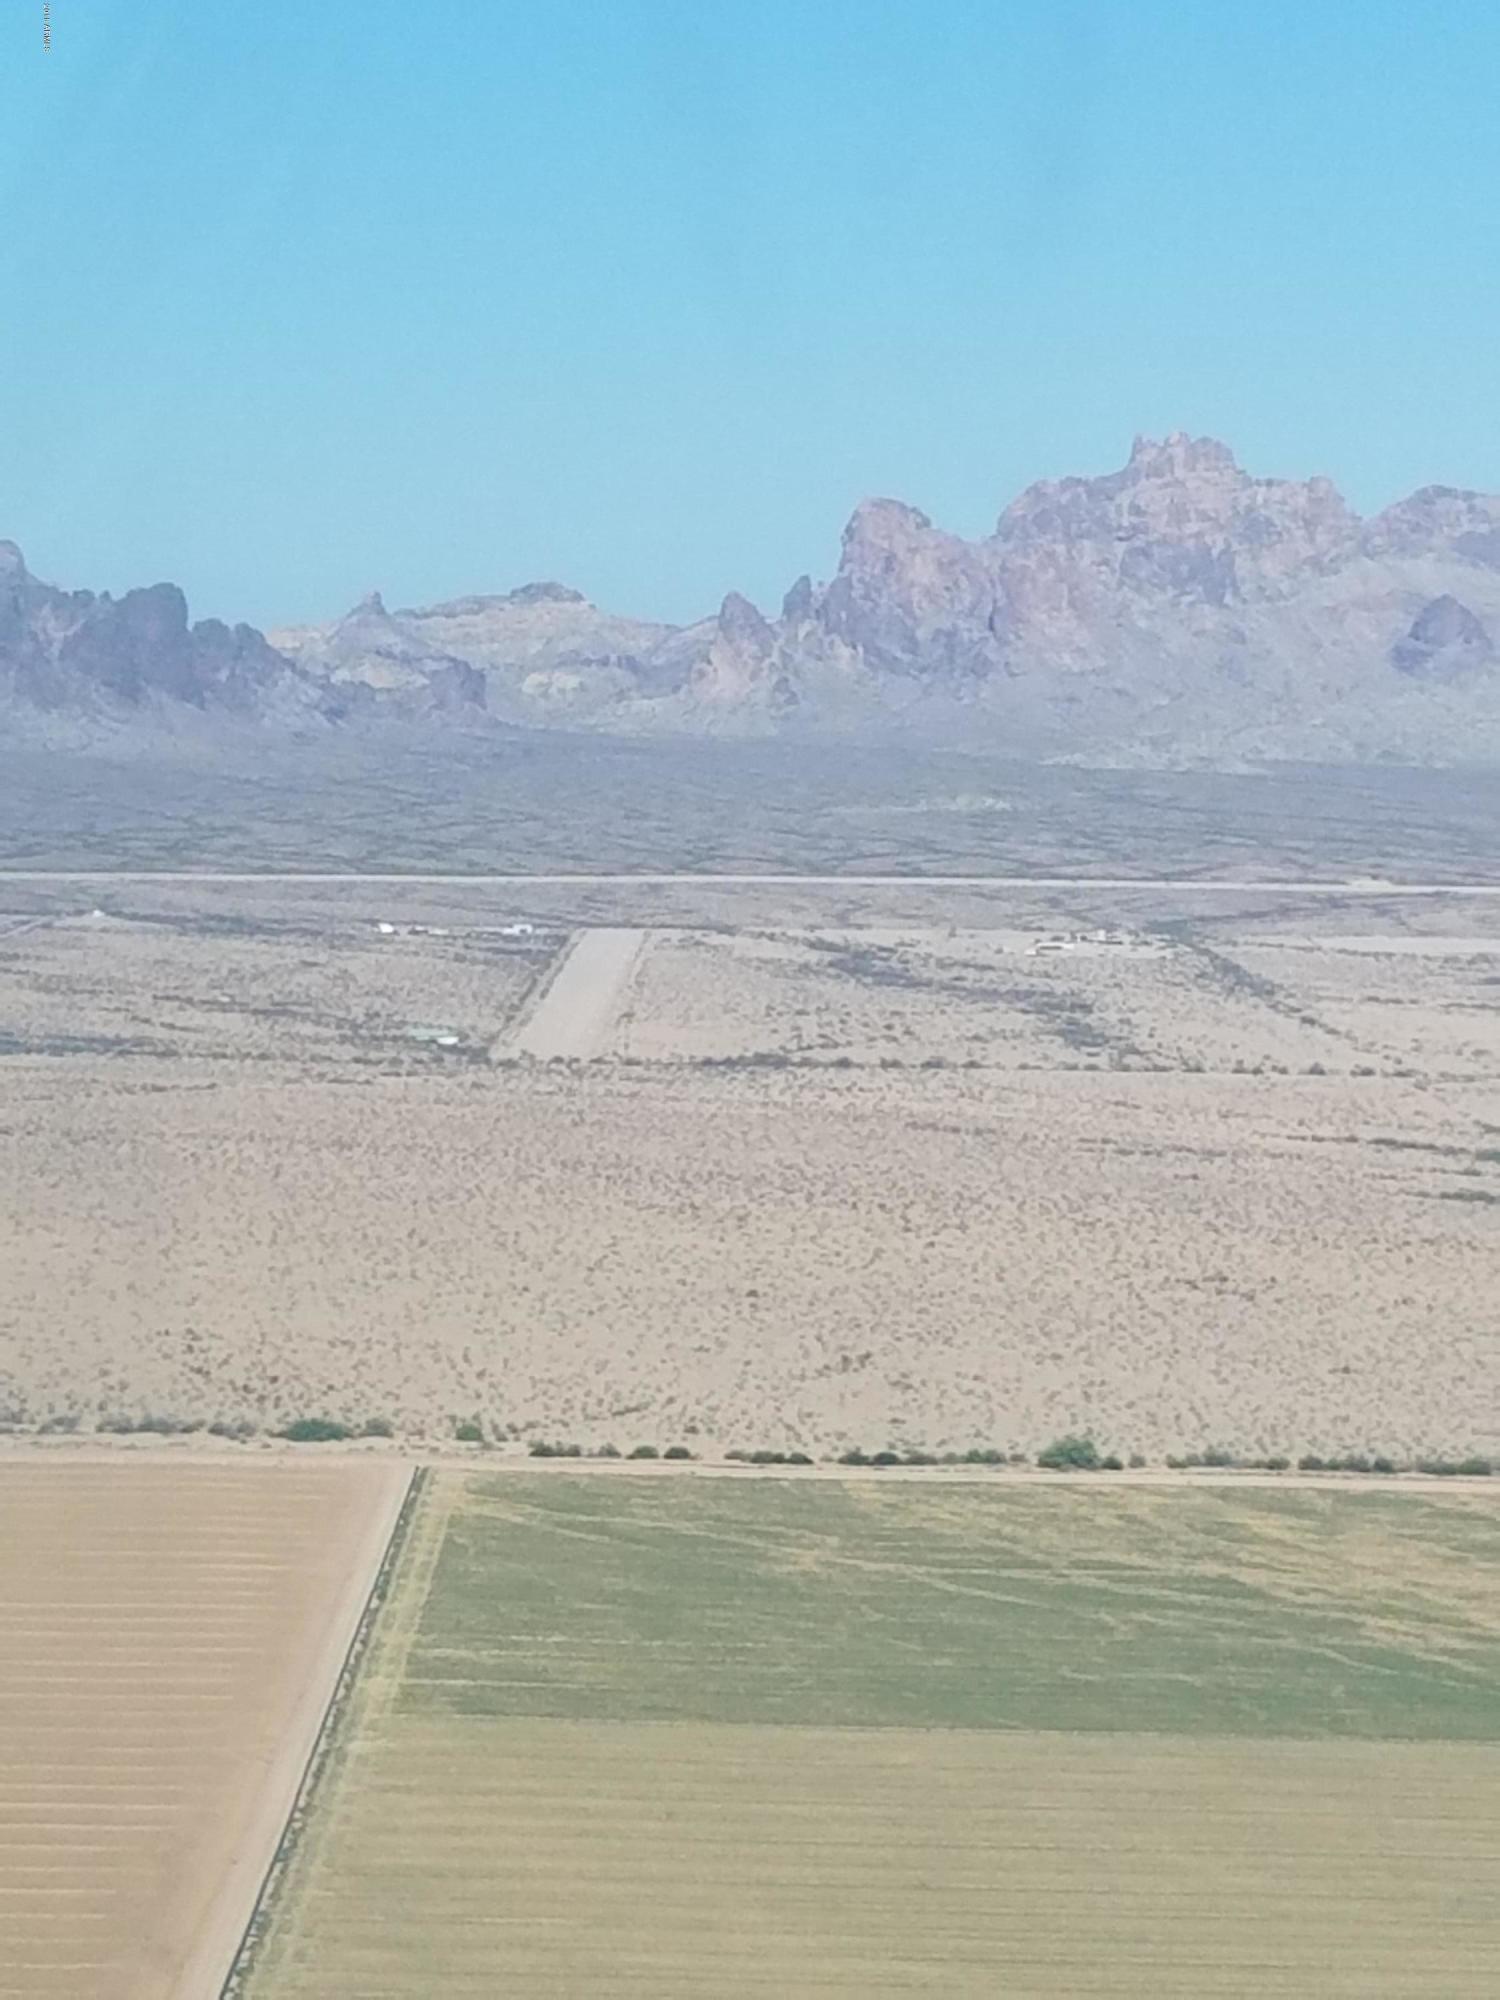 54202 W sunland Road # A2, Tonopah, Arizona 85354, ,Land,For Sale,54202 W sunland Road # A2,5688224